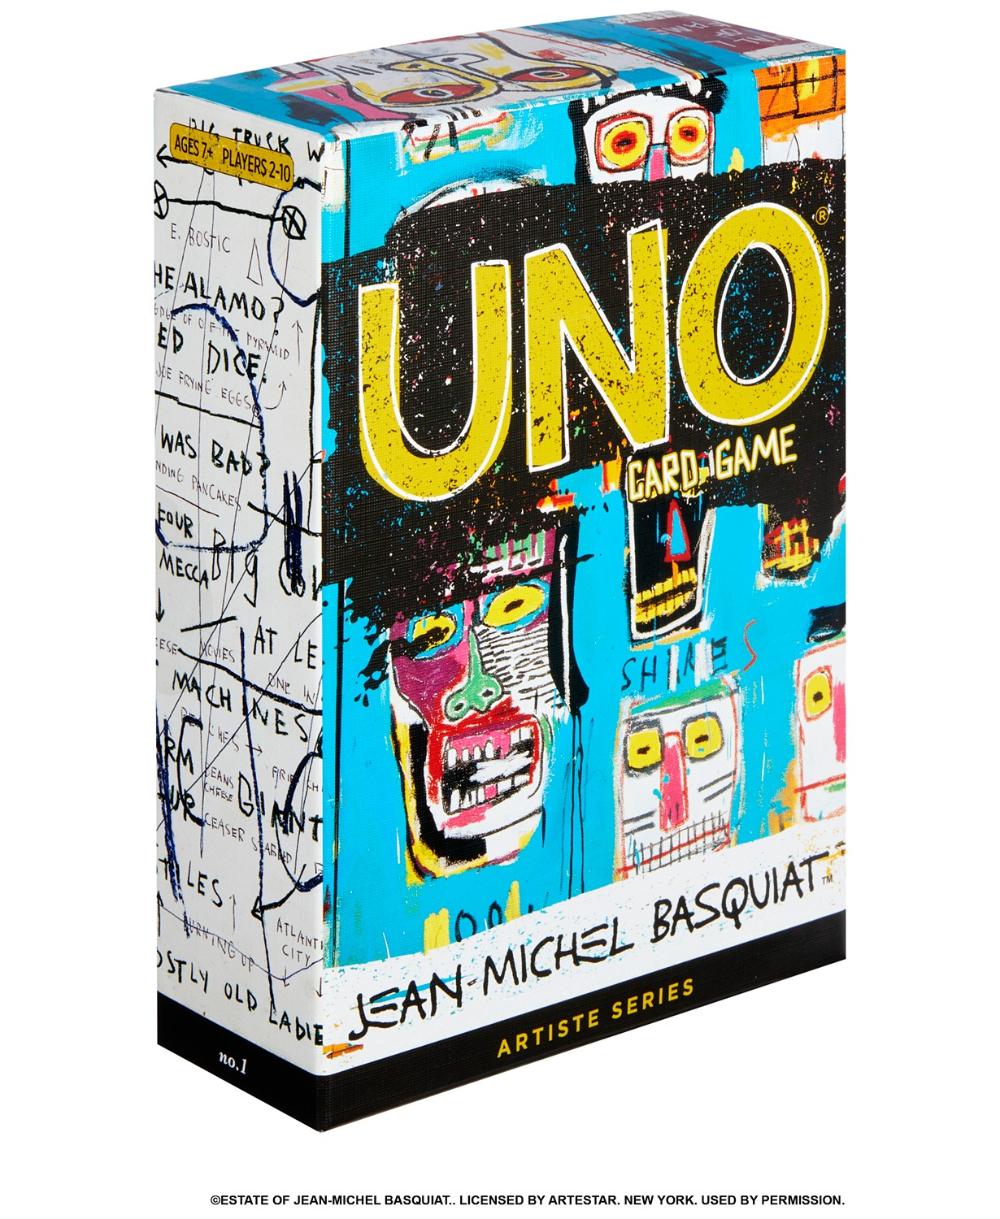 Mattel UNO Artiste Series No. 1, UNO® Card Game Featuring